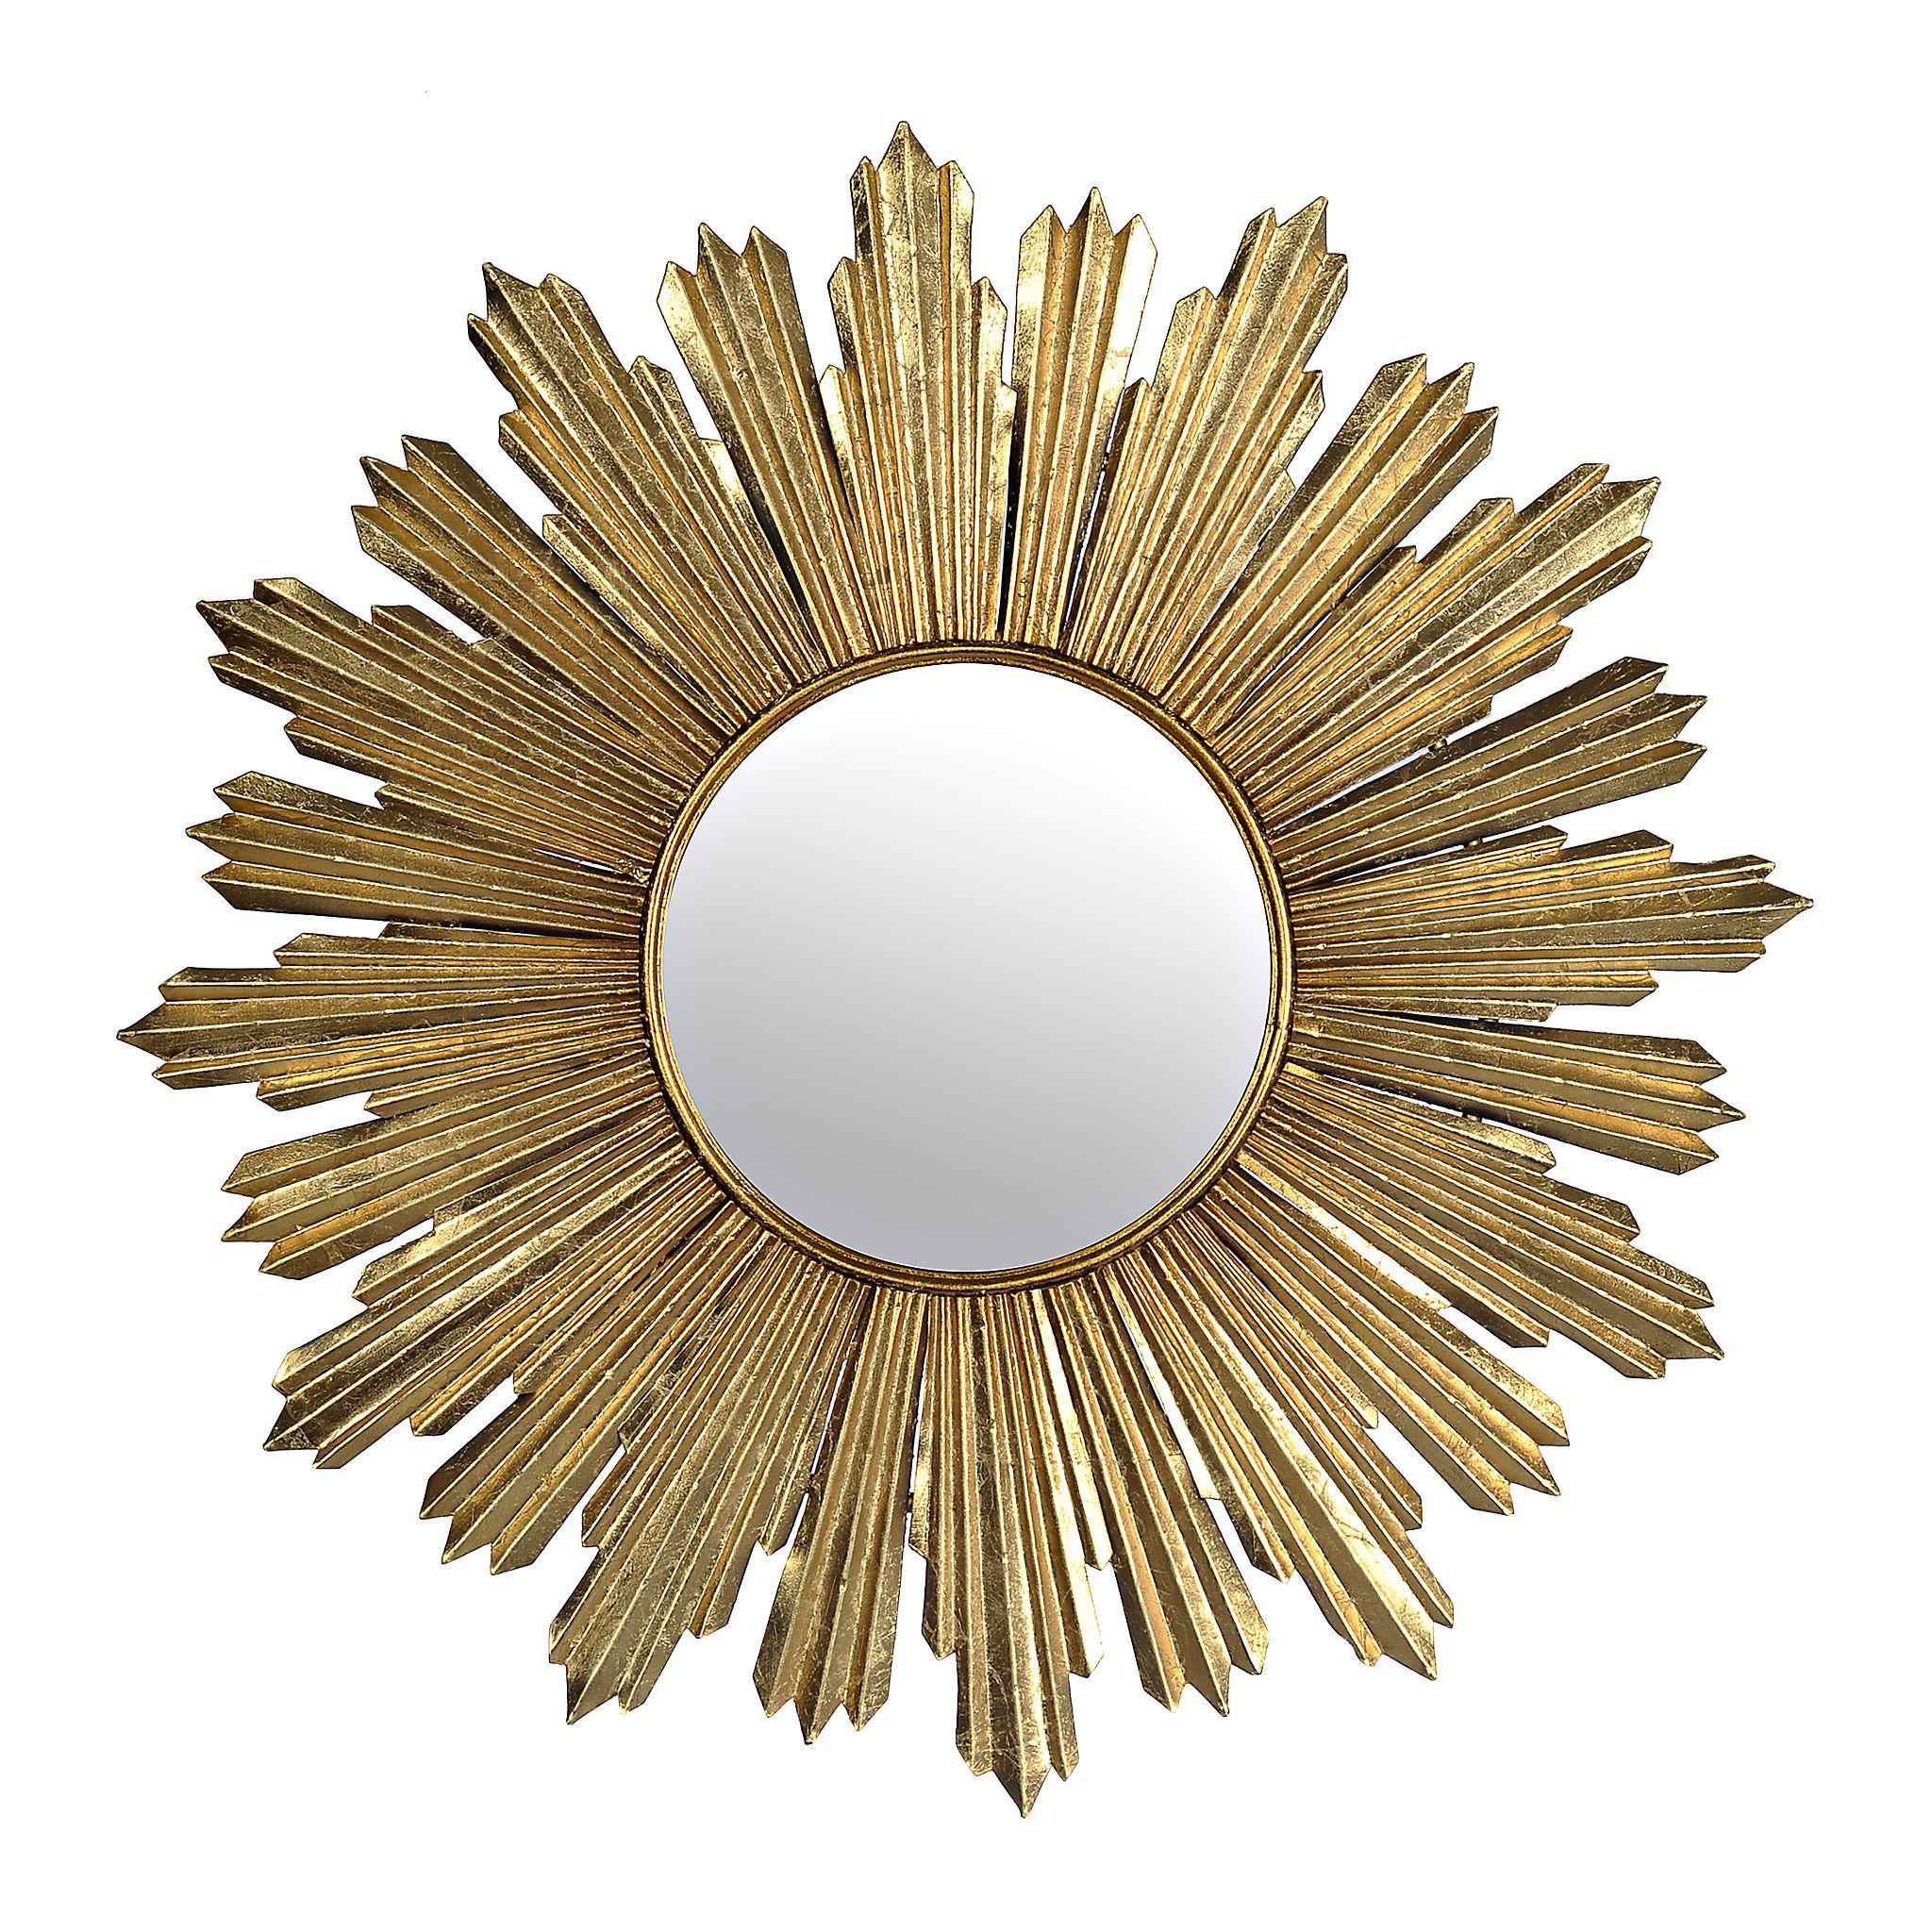 Gold Metallic Starburst Mirror Gold Starburst Mirror Starburst Mirror Mirror